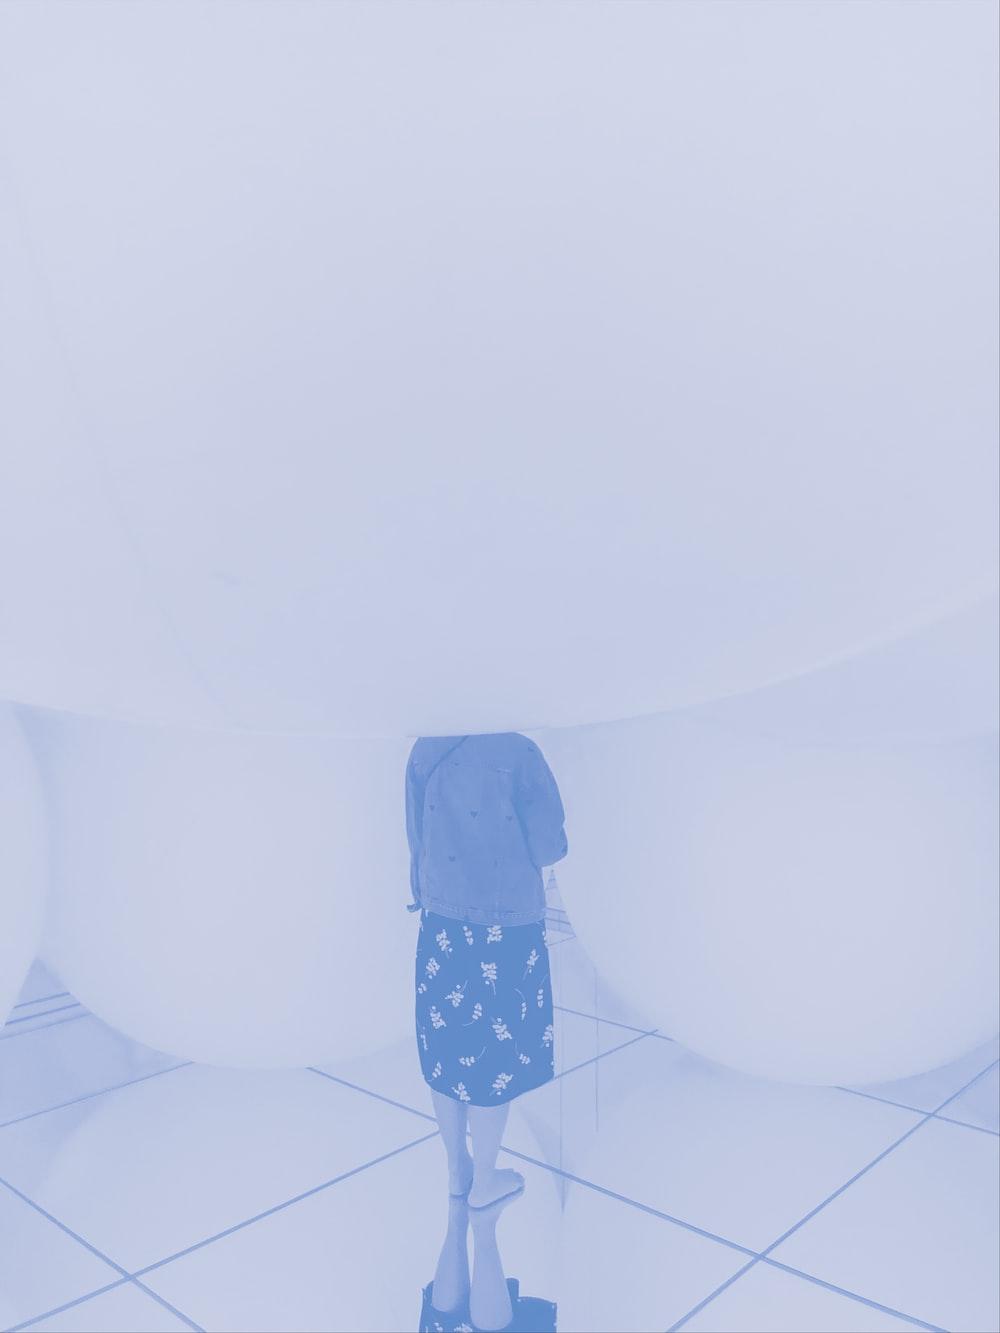 woman standing on tile floor